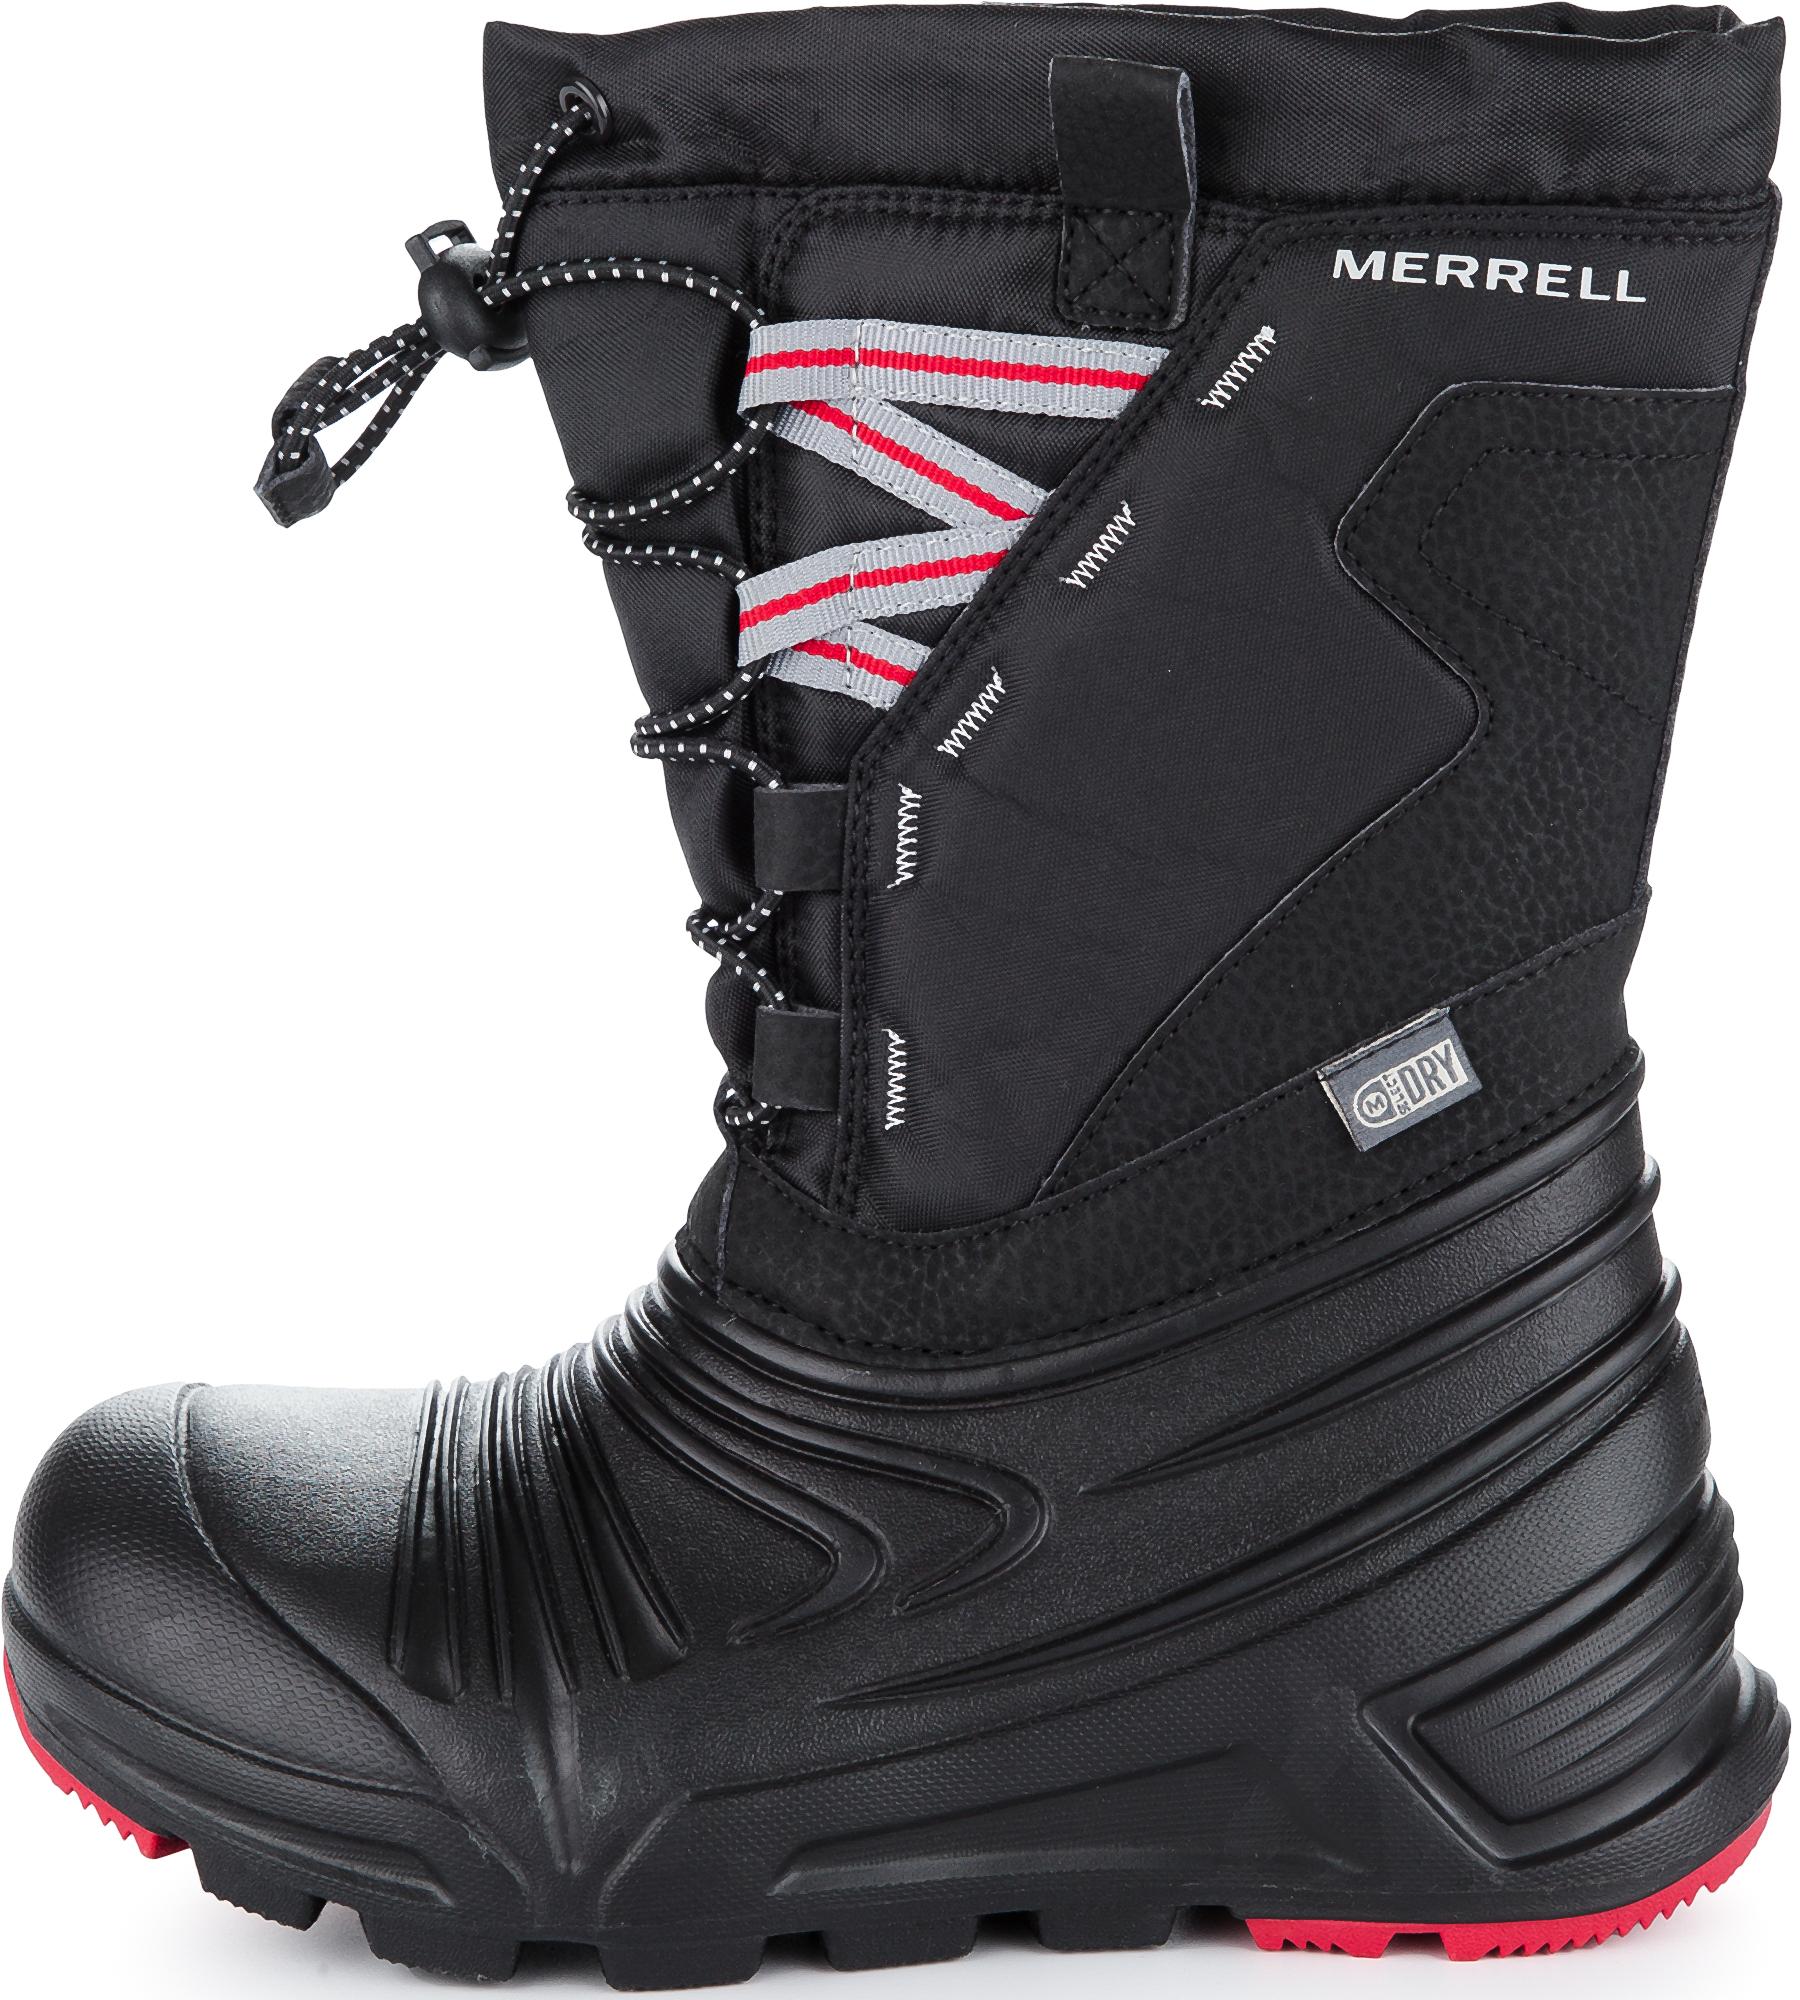 Merrell Ботинки утепленные для мальчиков Merrell M-Snow Quest Lite 2.0, размер 34,5 цены онлайн